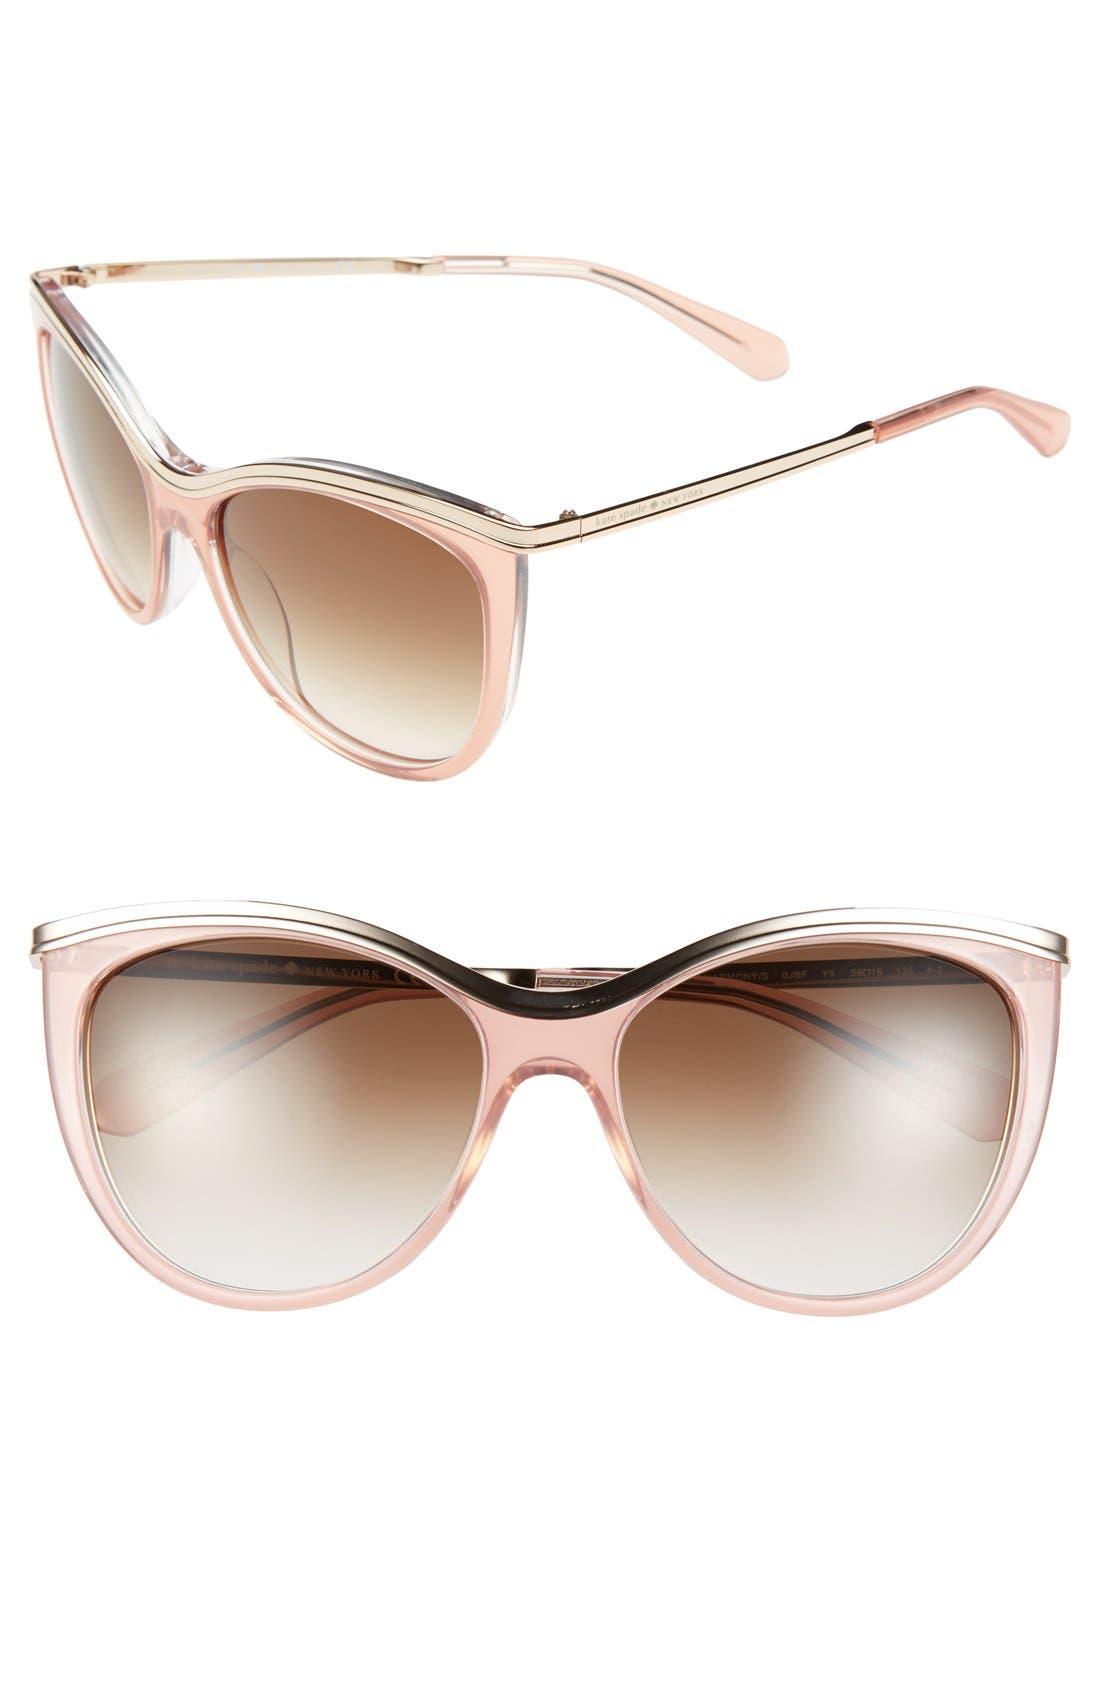 Main Image - kate spade new york 56mm cat eye sunglasses